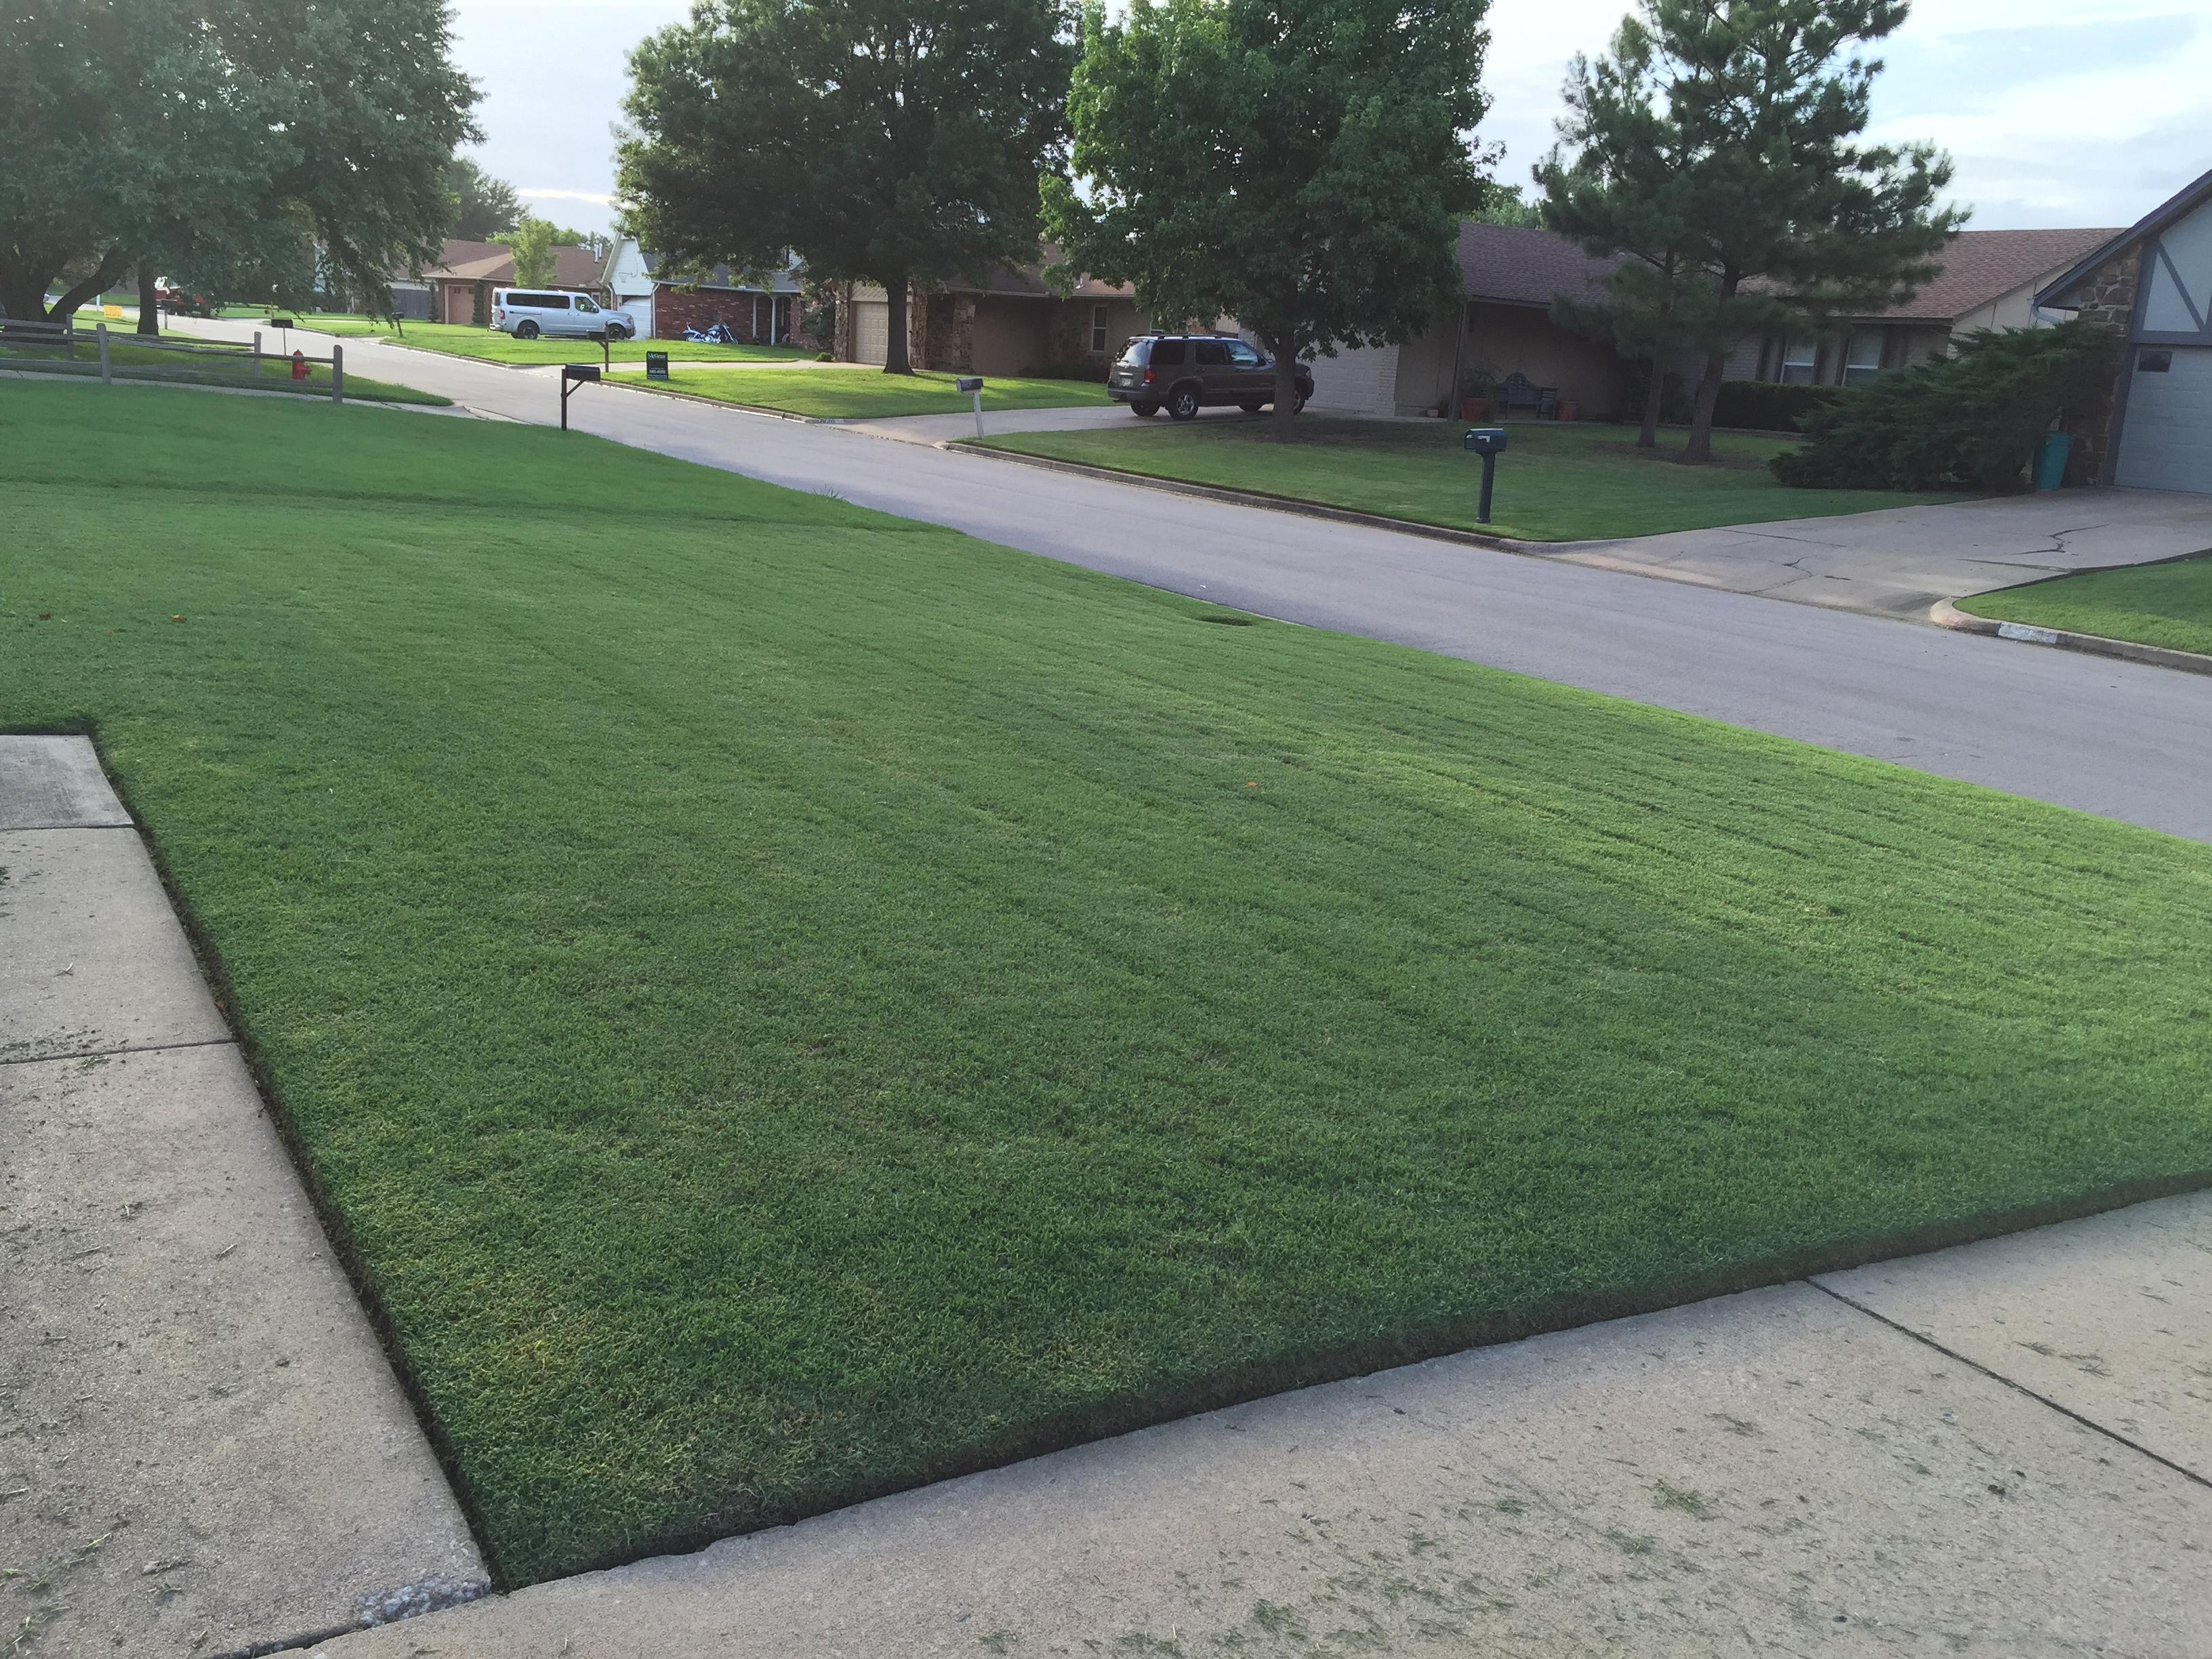 Advanced turf solution llc in broken arrow ok for Home turf texas landscape design llc